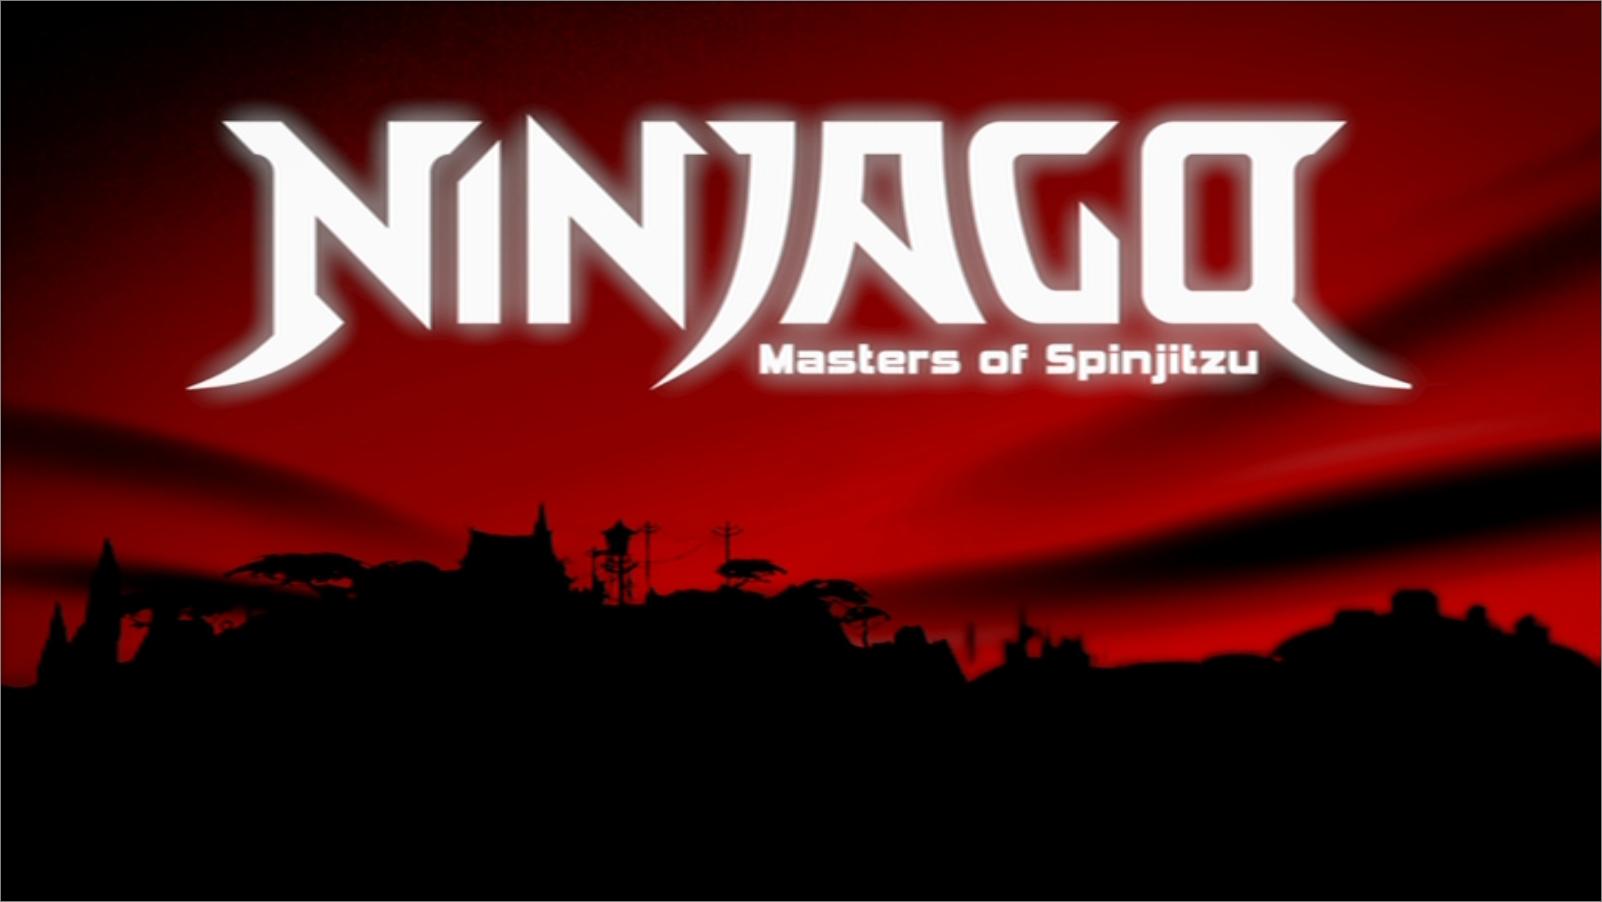 Ninjago: Masters of Spinjitzu   Brickipedia   FANDOM powered